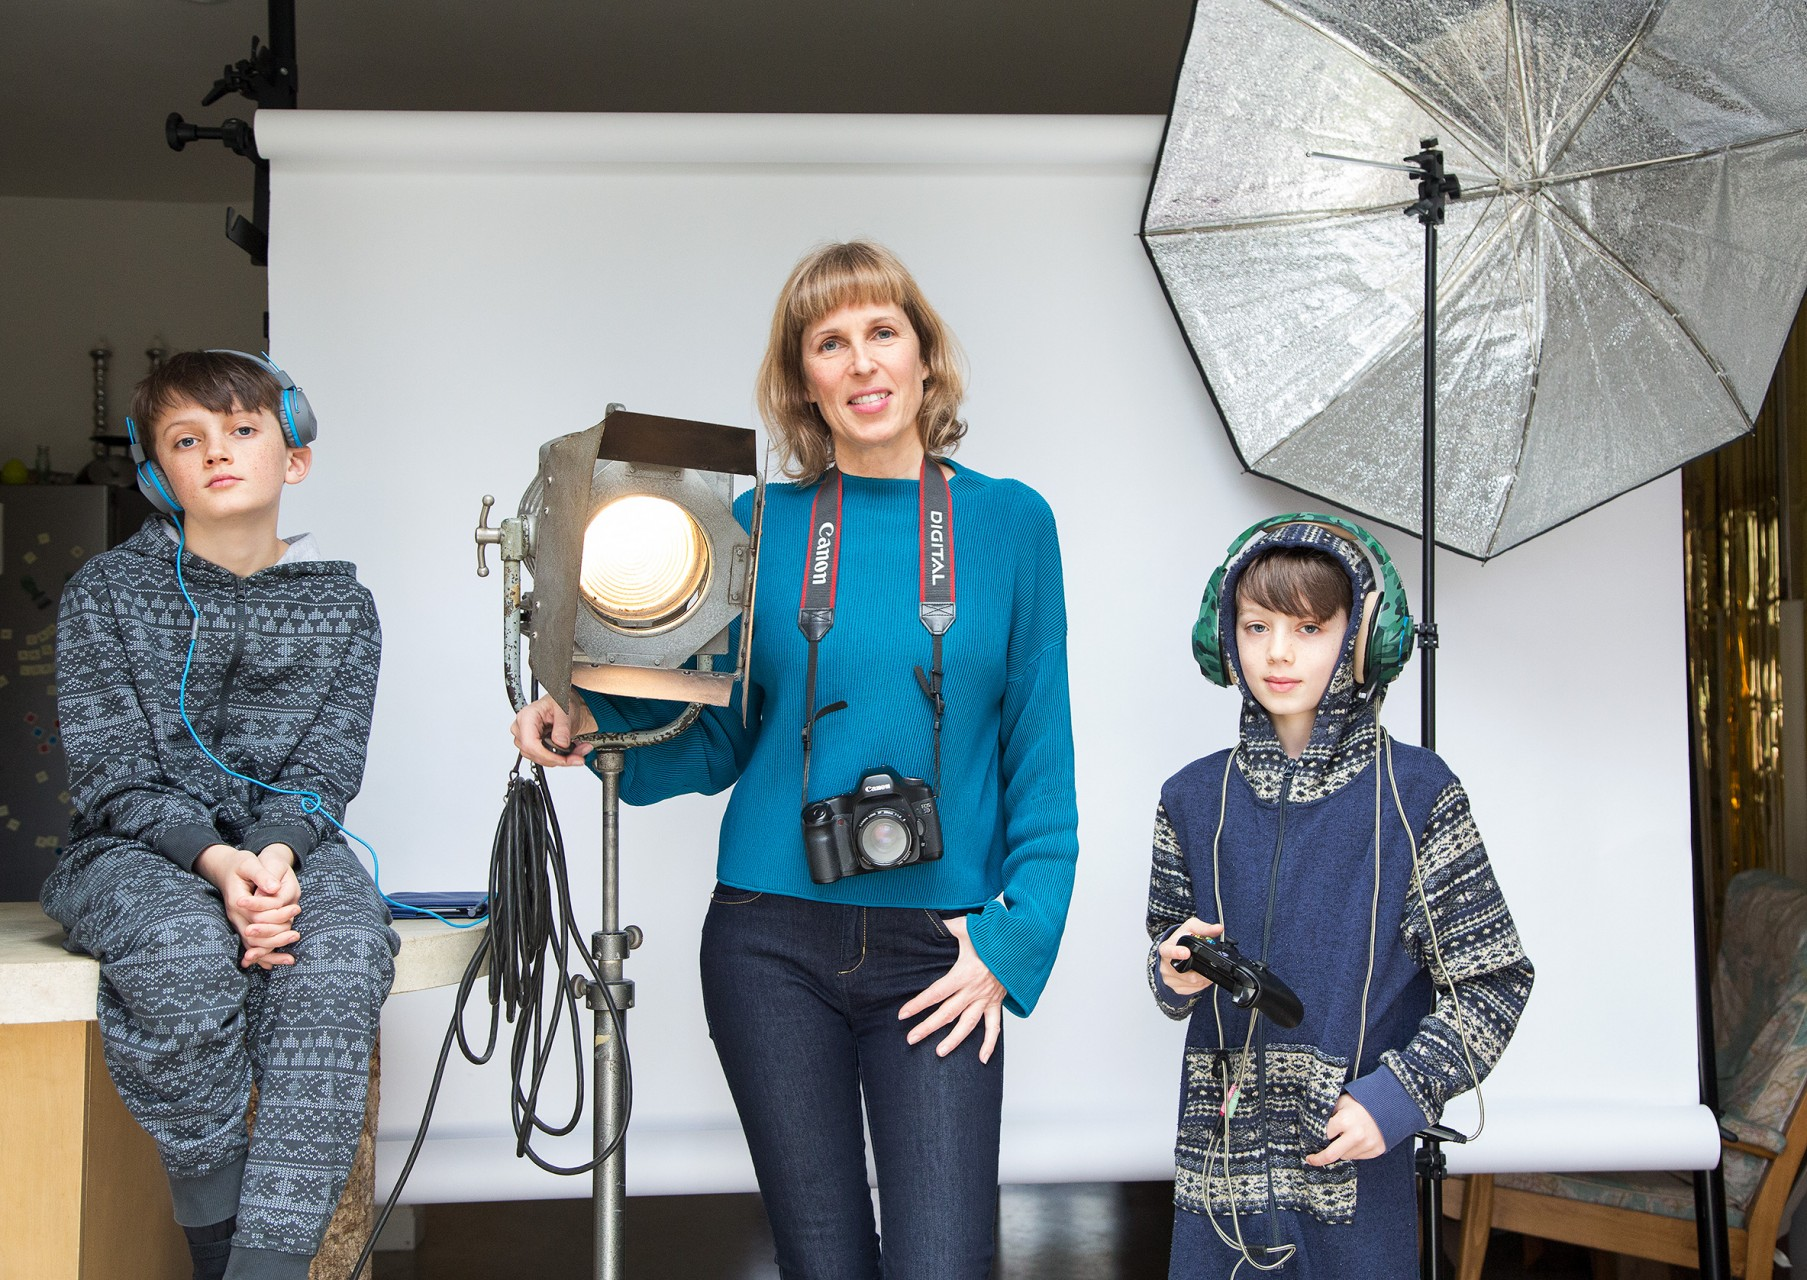 Fiona Freund - Photographer